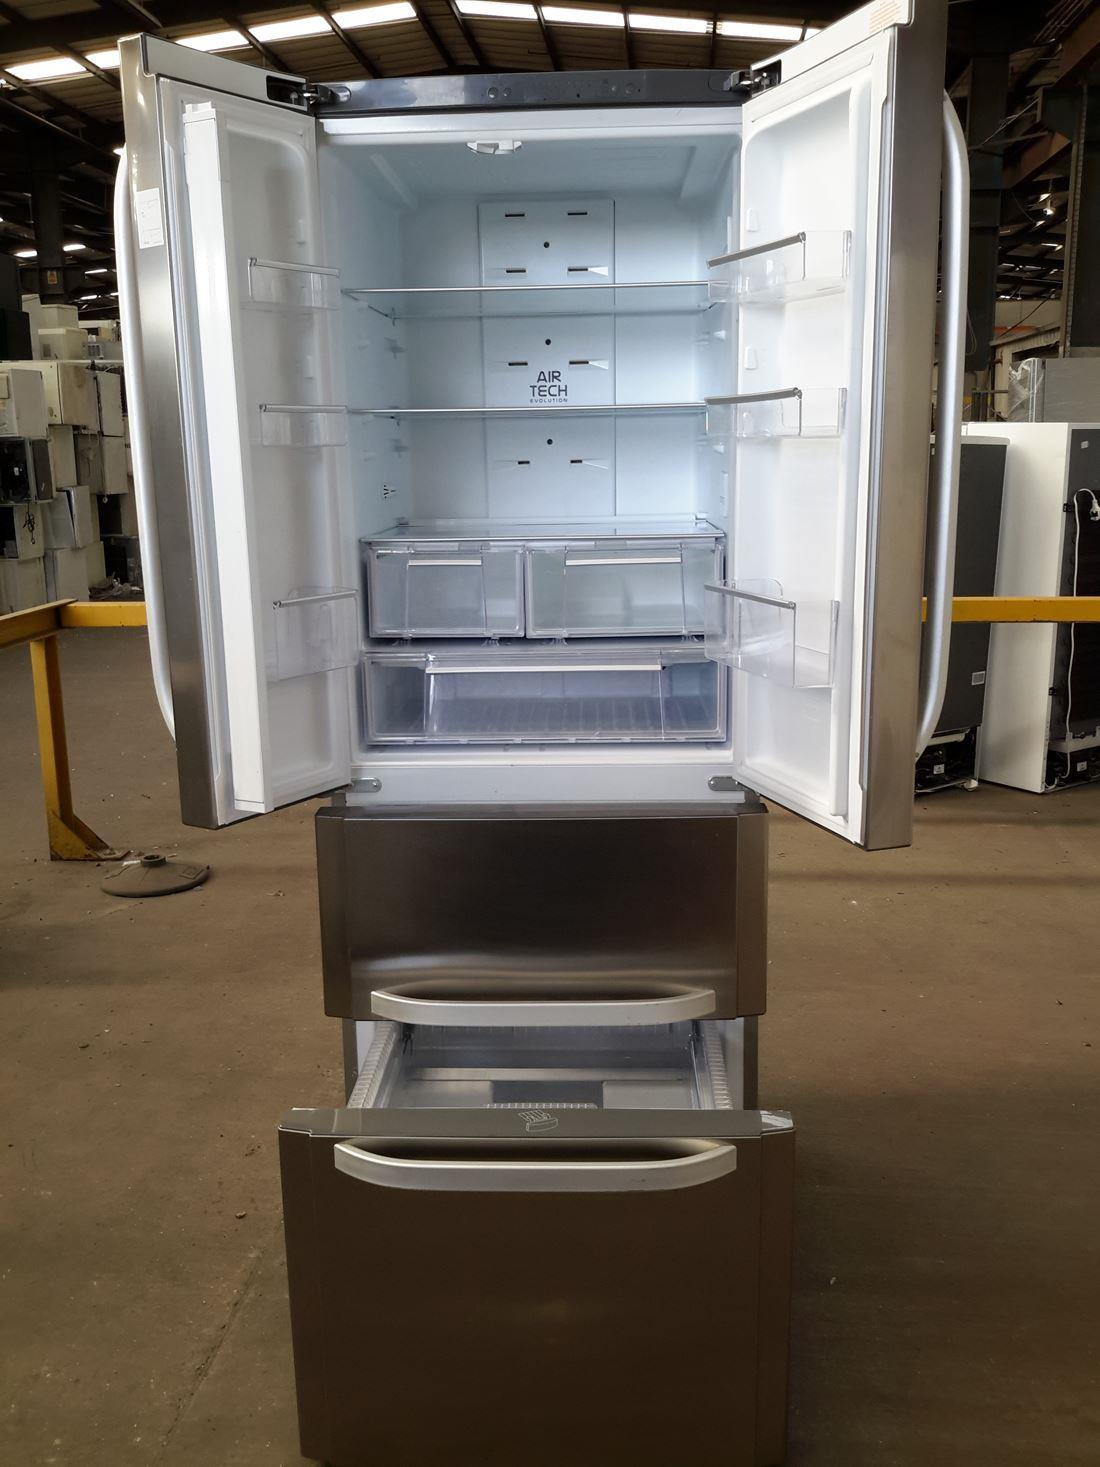 Hotpoint Ffu3dx Frost Free Freestanding Fridge Freezer